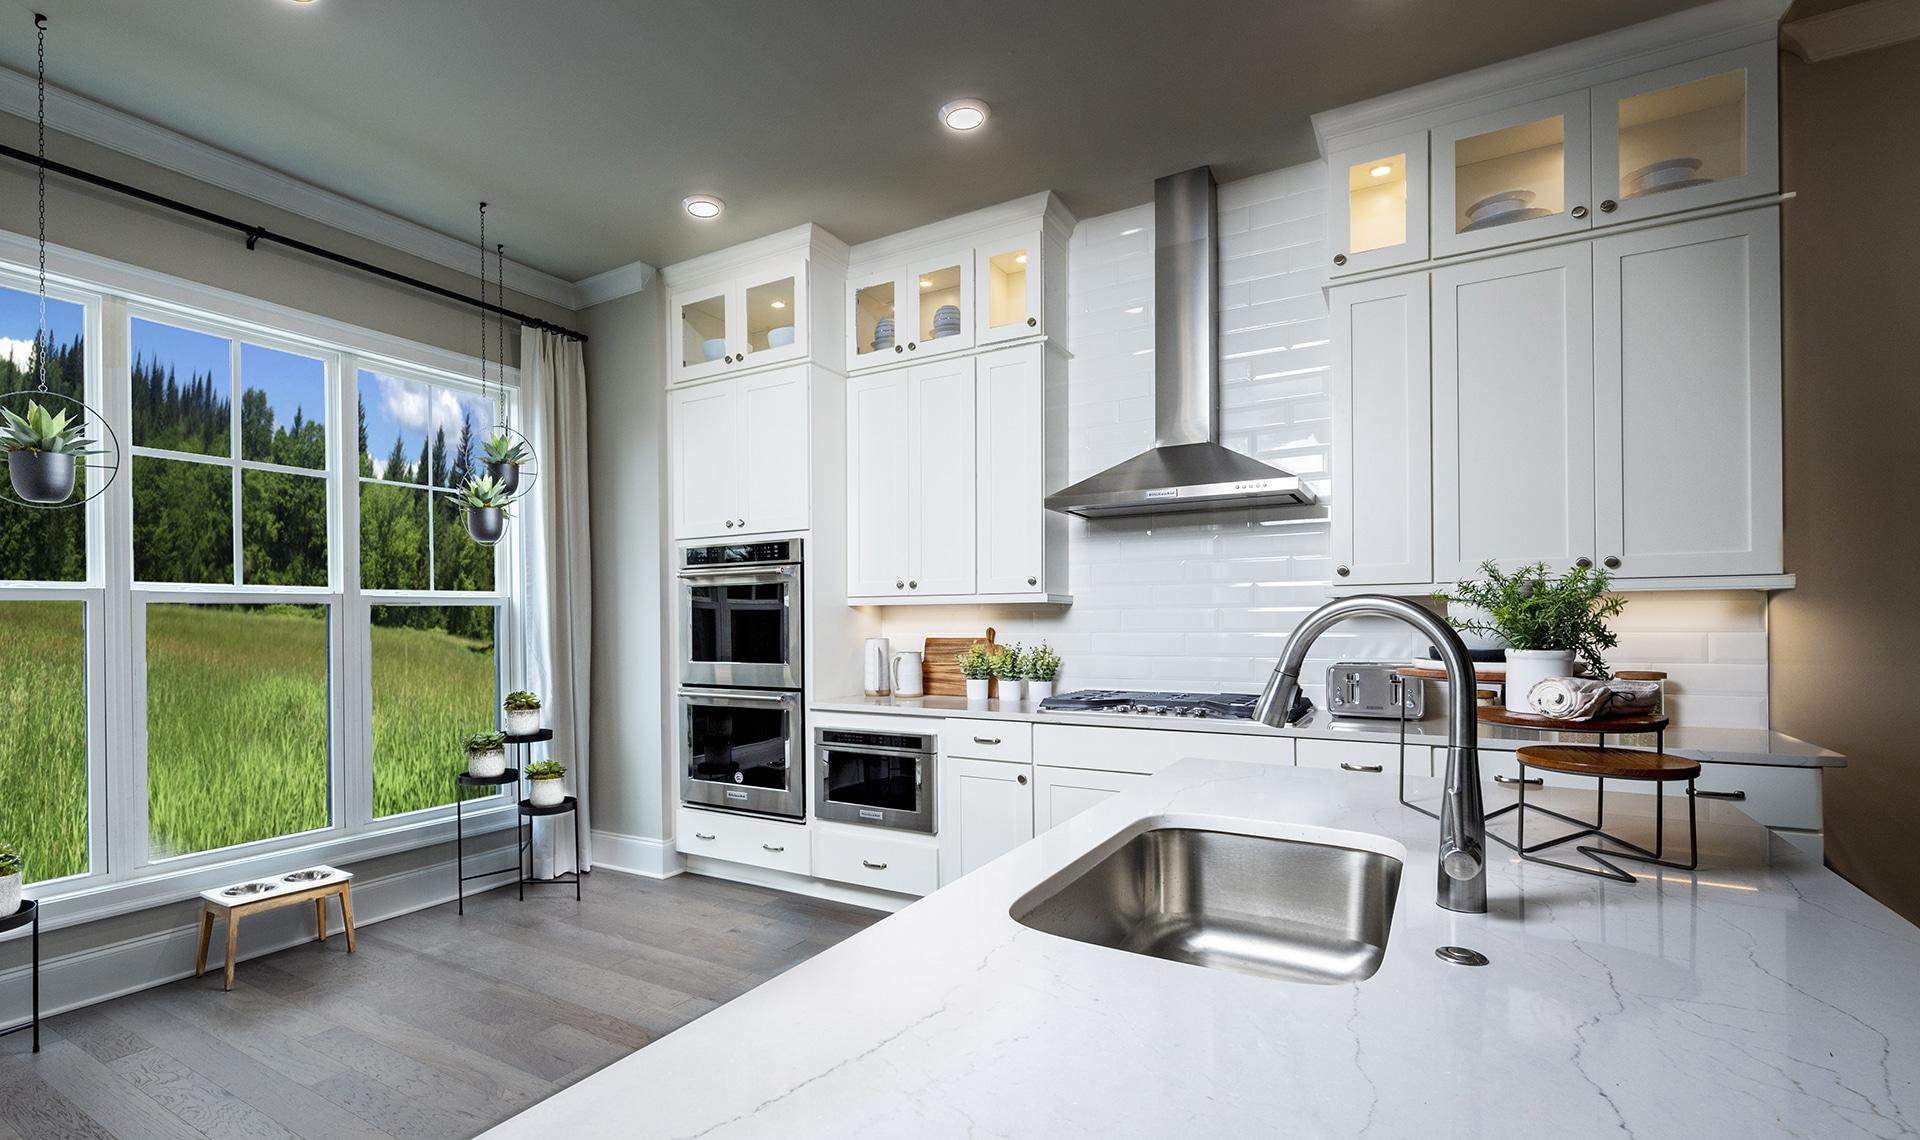 Virtual Open Houses at New Intown, Metro Atlanta Communities